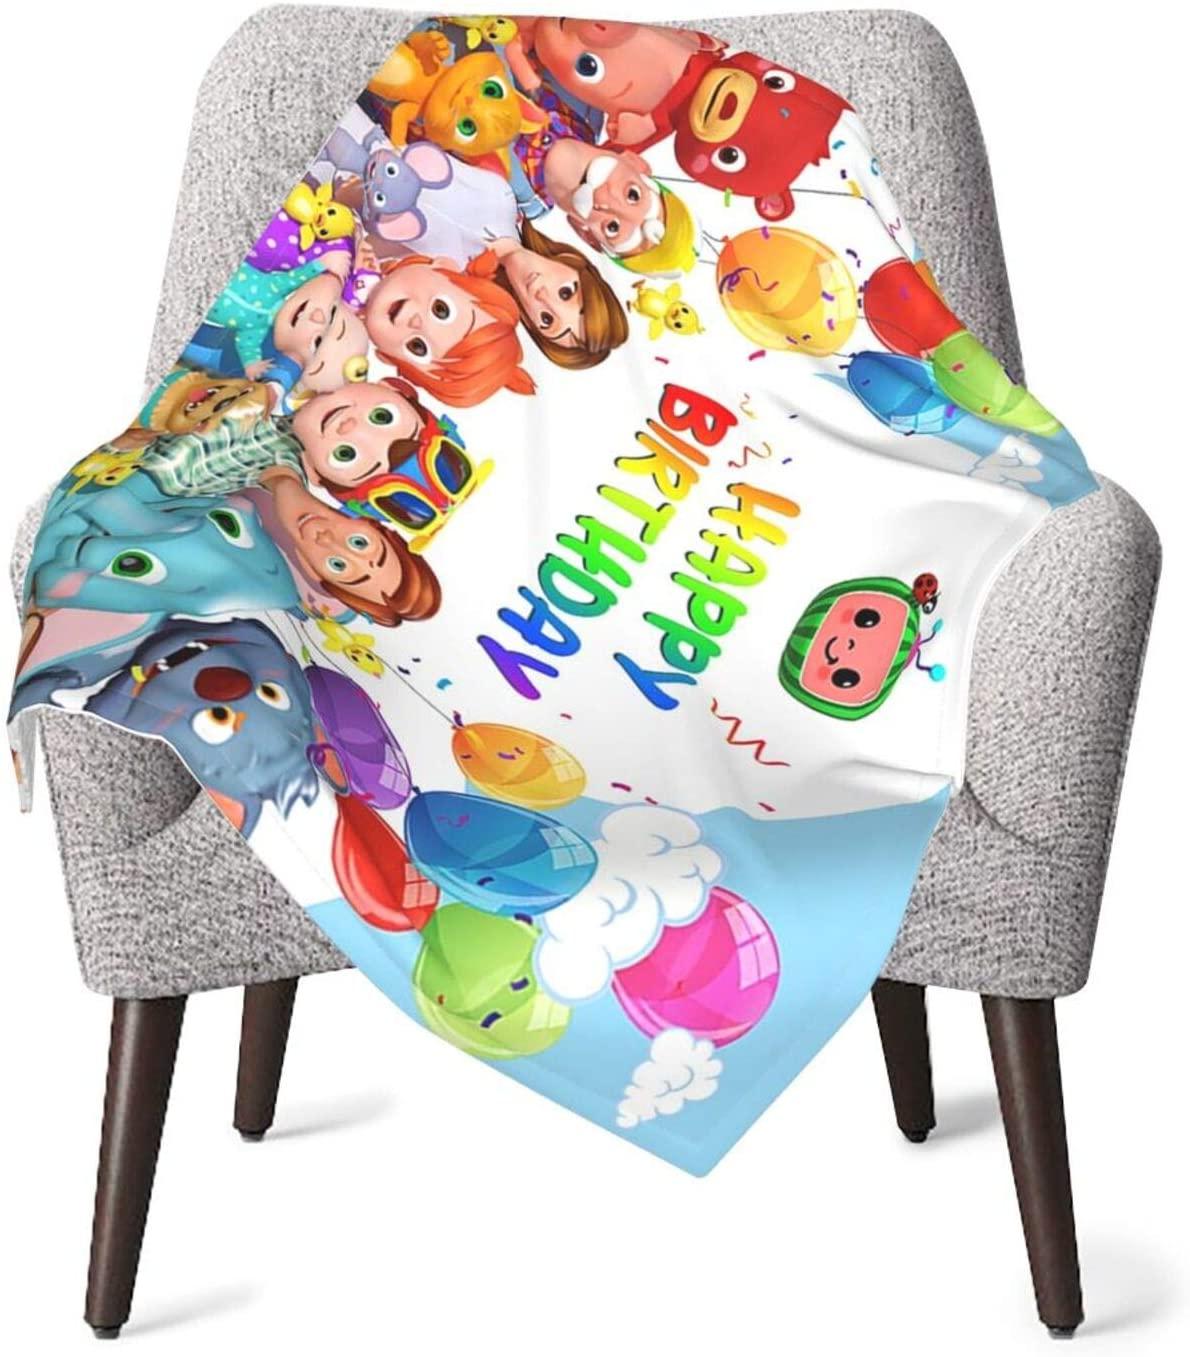 Ktdbthut Cocomelon Soft Blanket Baby Shower Soft Baby Blanket for Baby Boy Or Girl Black